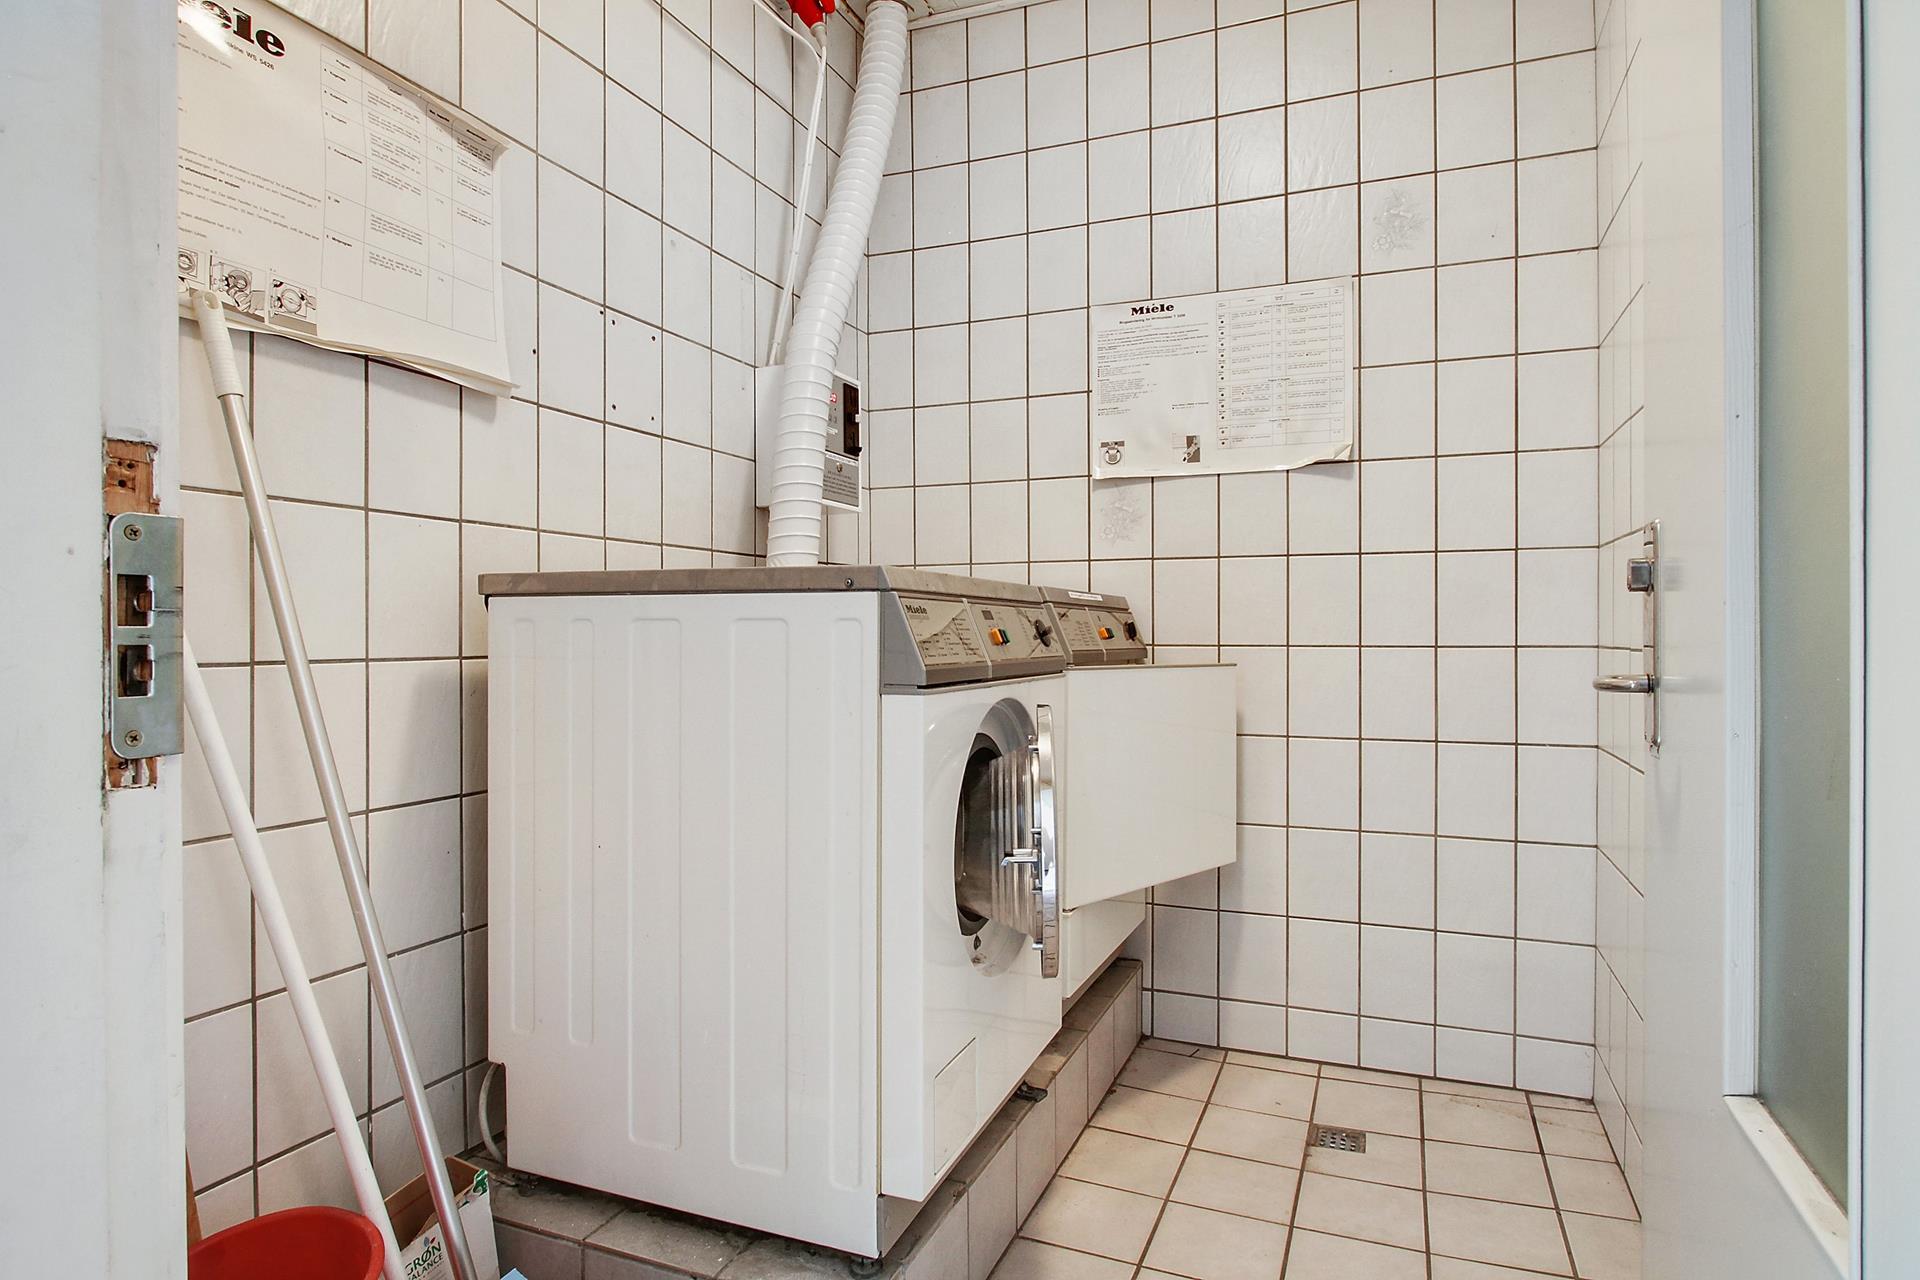 Bolig/erhverv på Struervej i Holstebro - Vaskerum